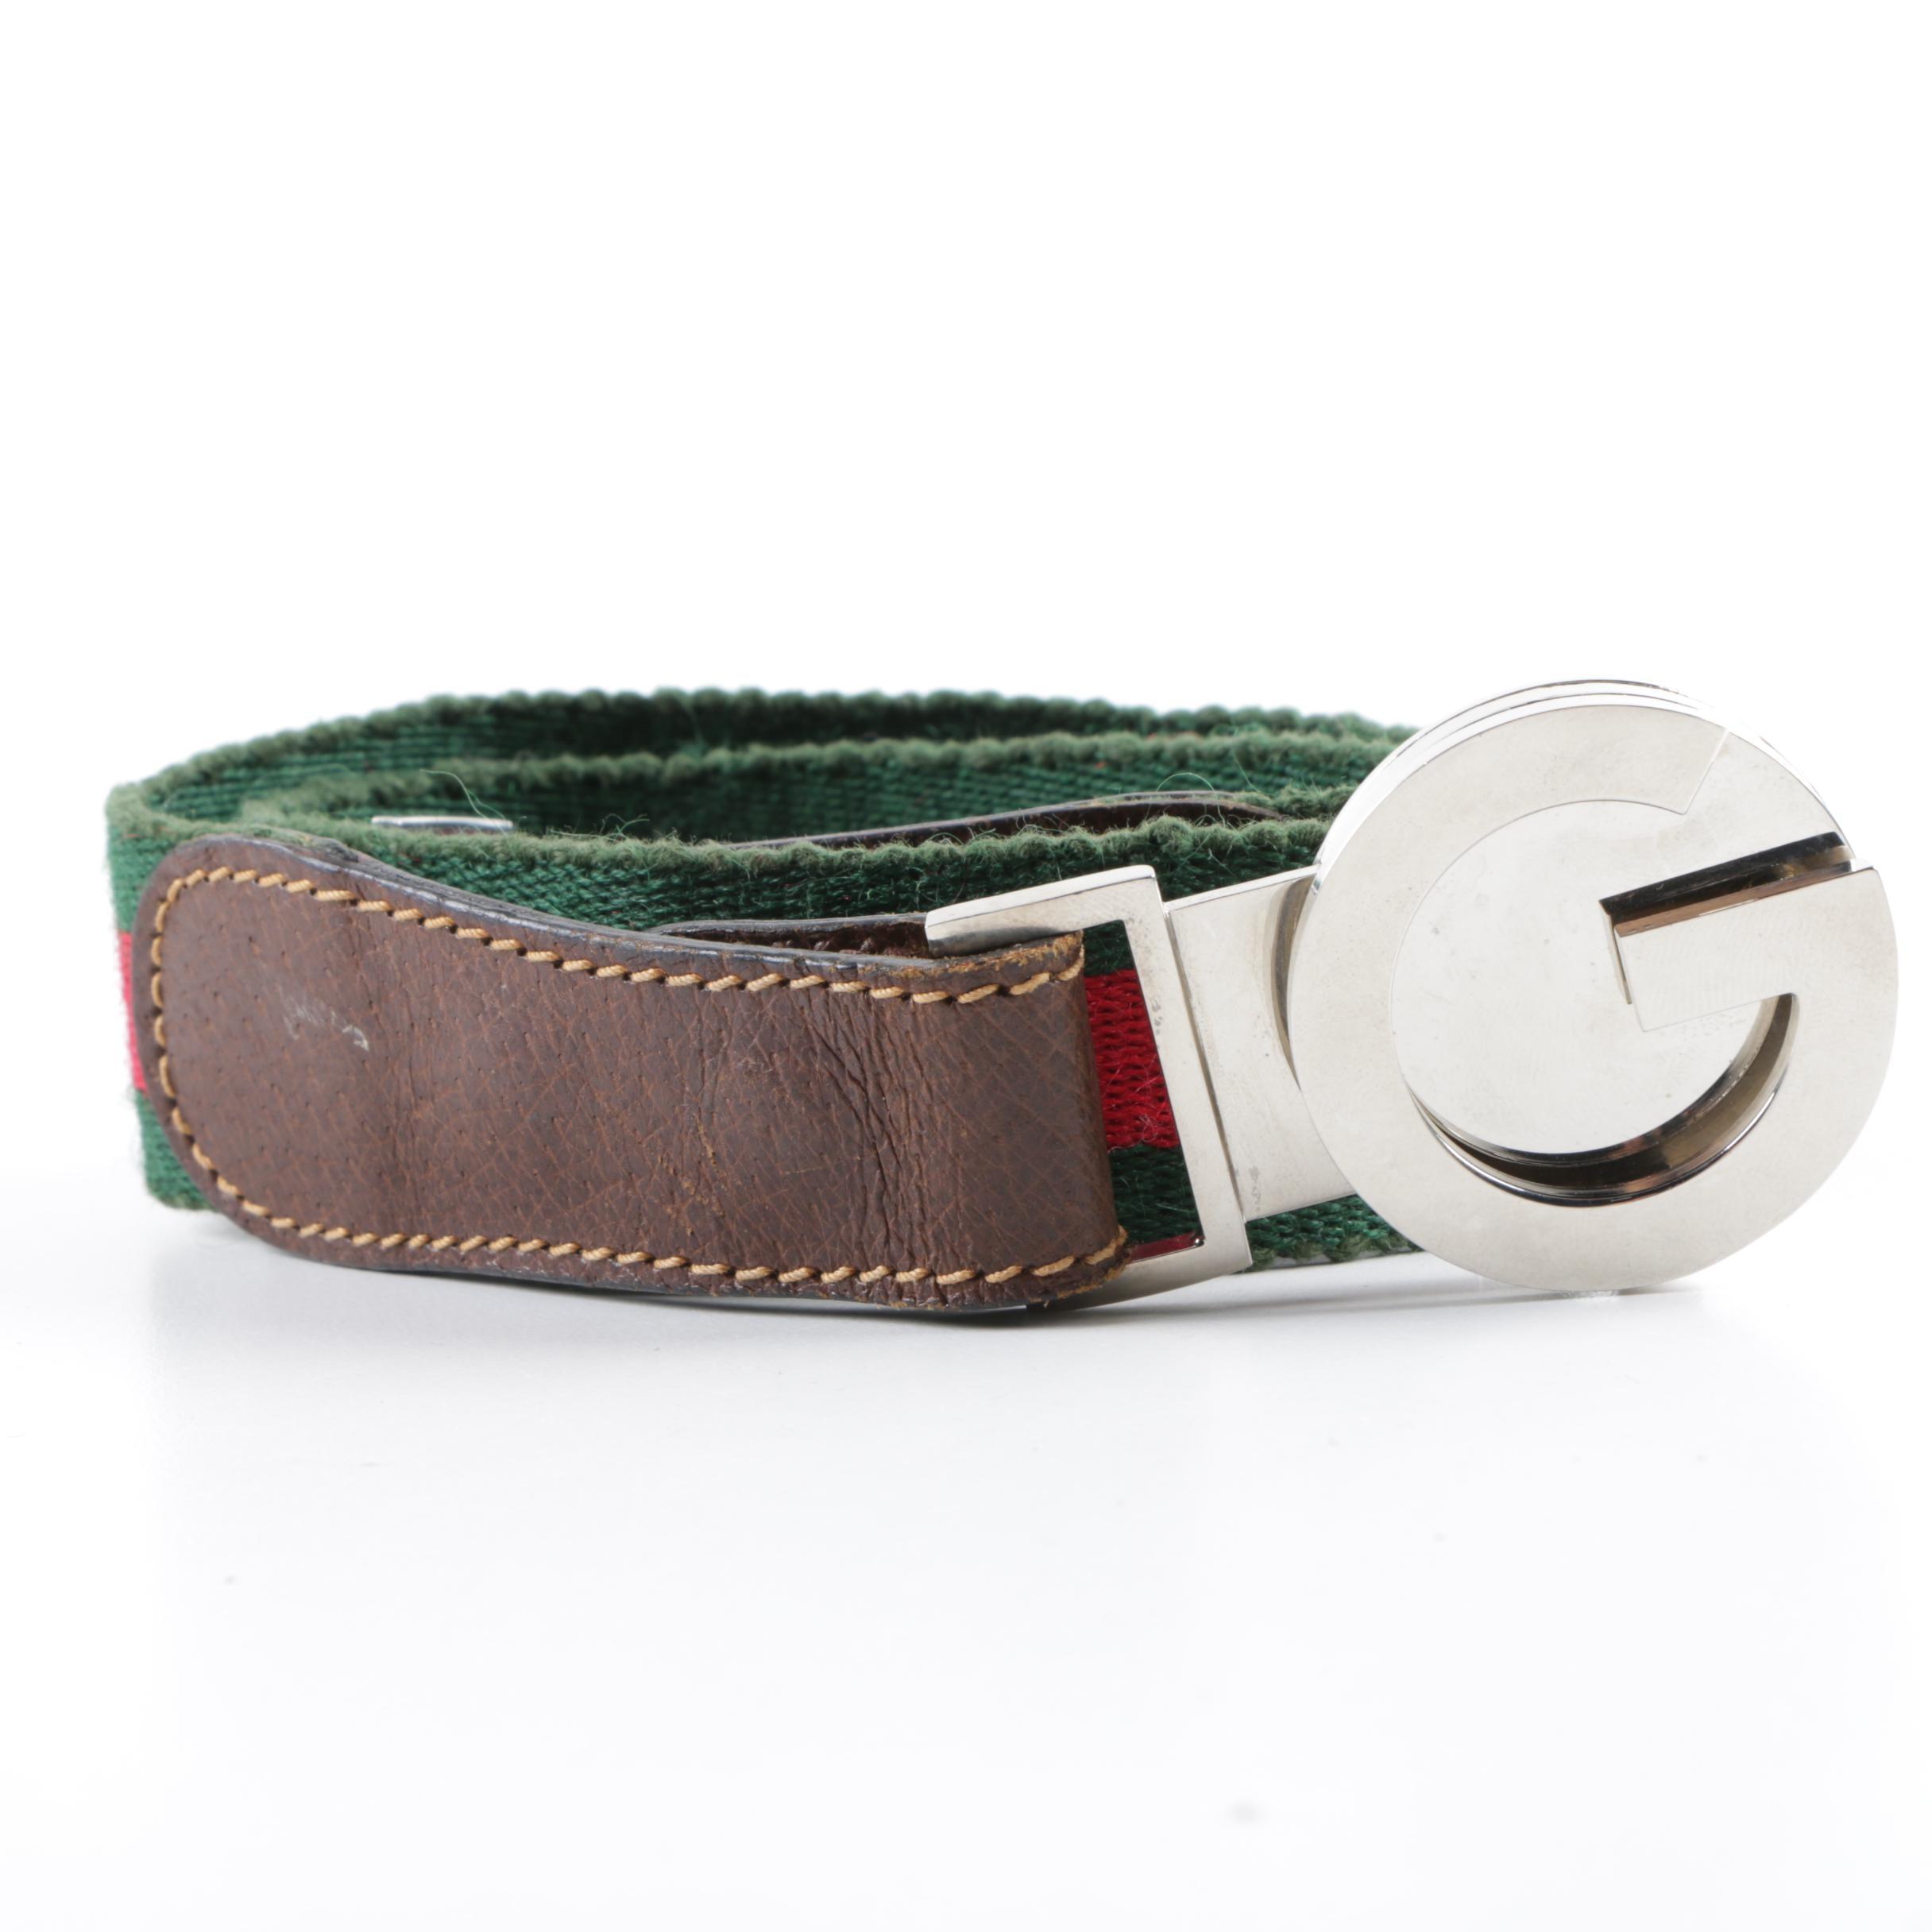 1970s Vintage Gucci Belt with Original Box